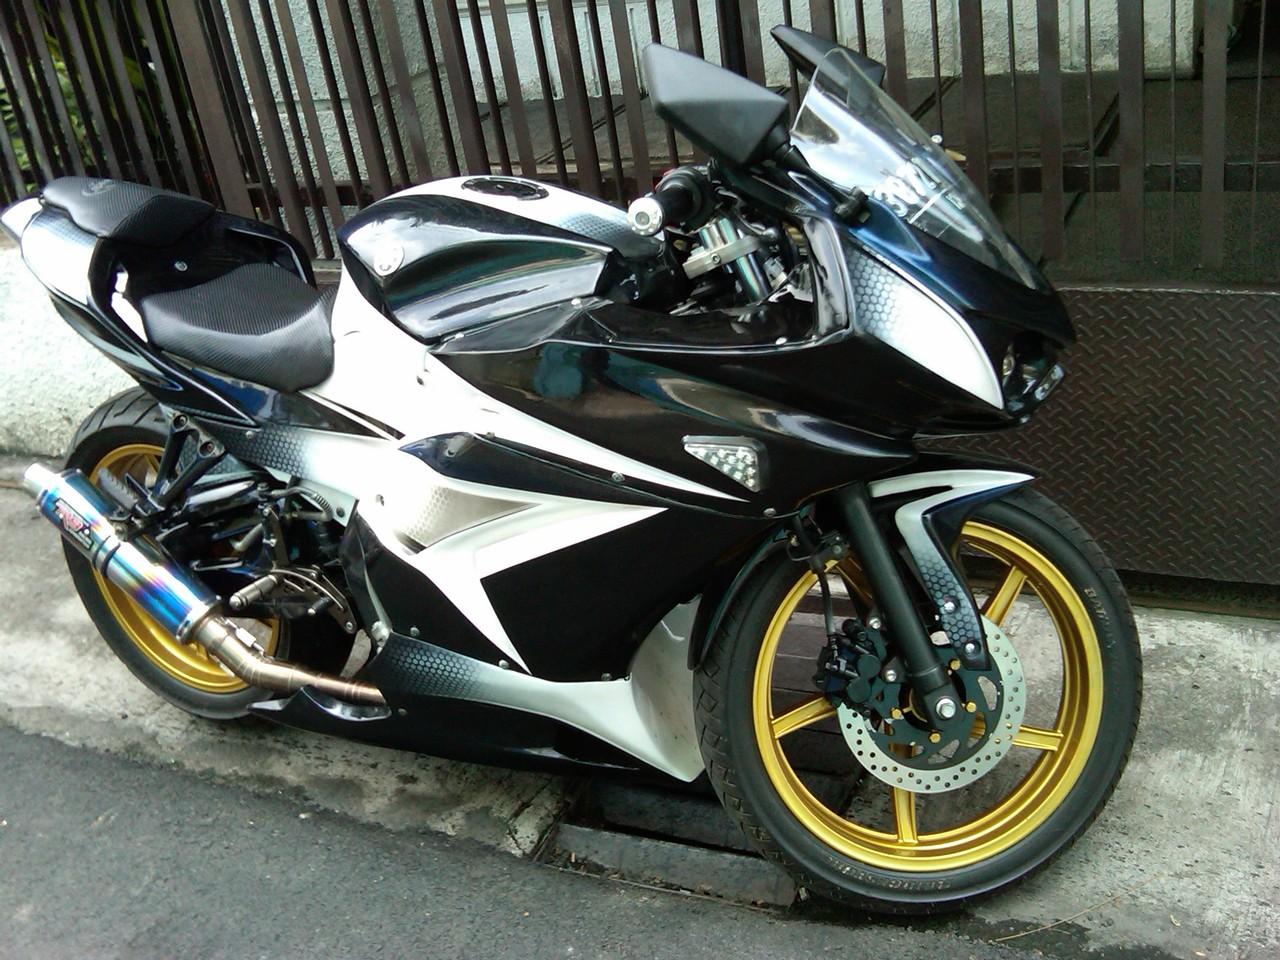 Foto Modif Motor Yamaha Vixion Terbaru Modifikasi Motor Yamaha